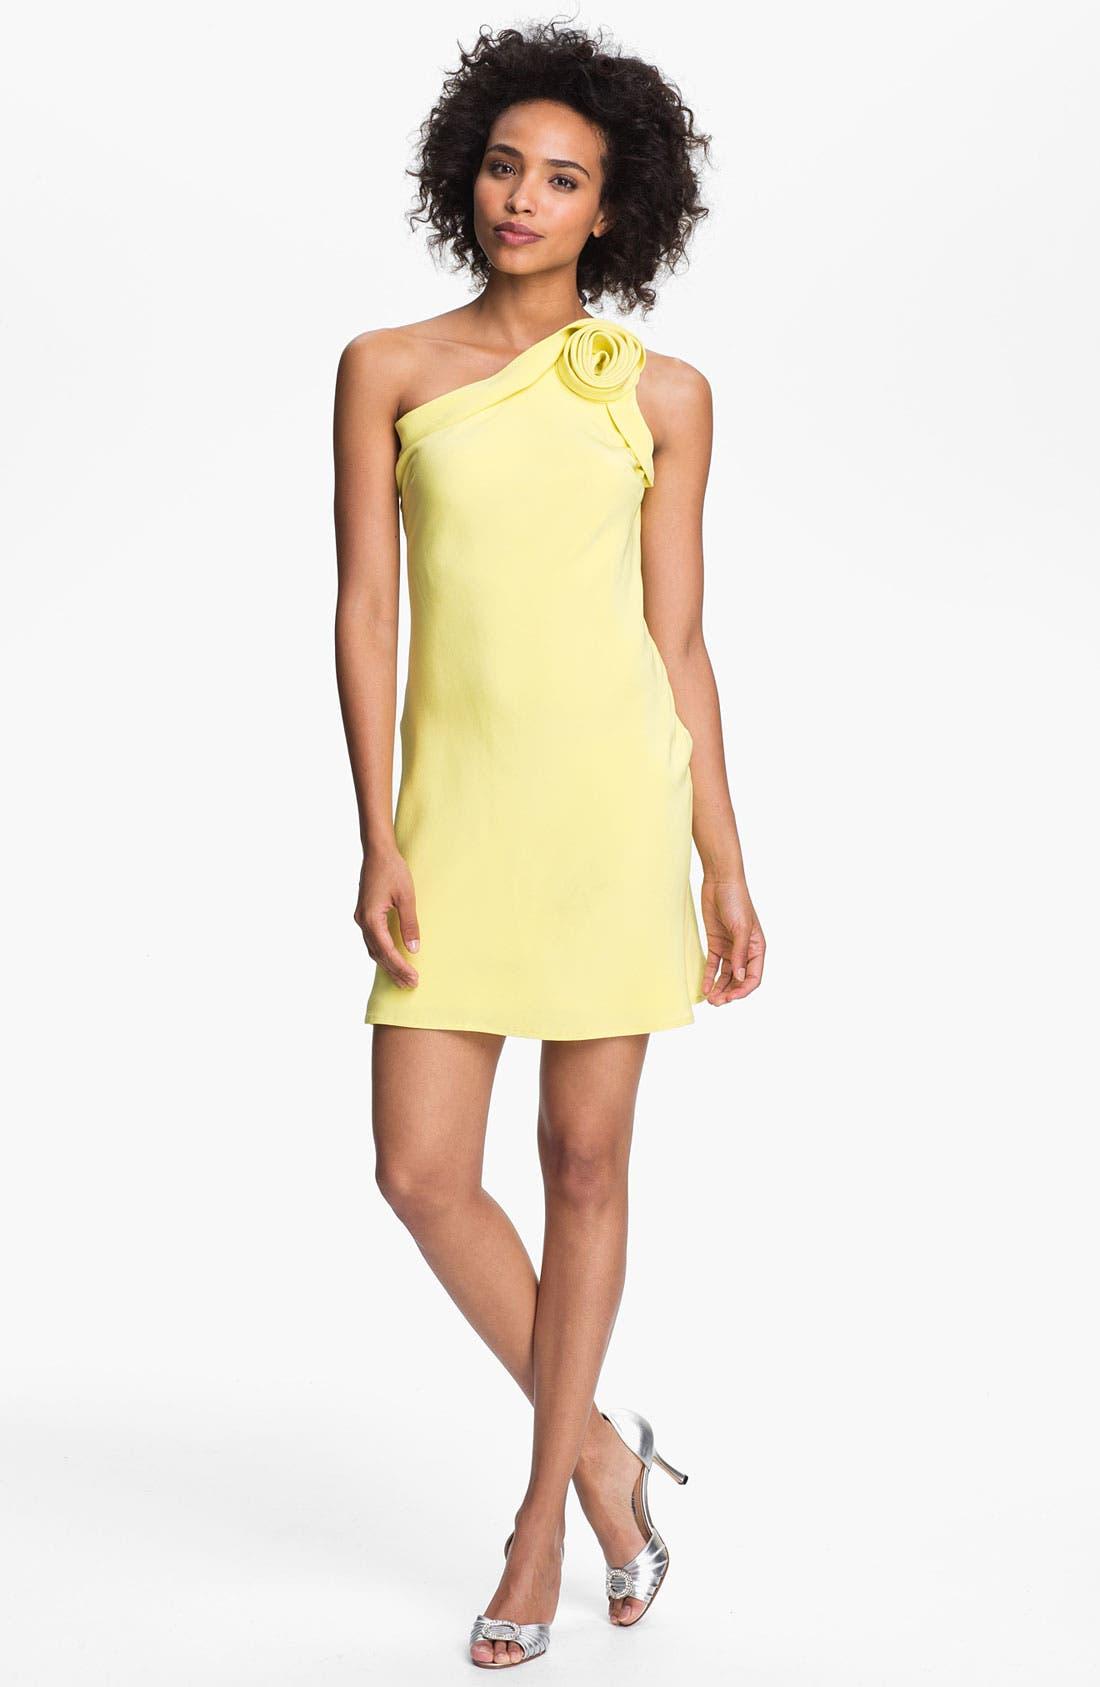 Alternate Image 1 Selected - A.B.S. by Allen Schwartz Rosette One Shoulder Dress